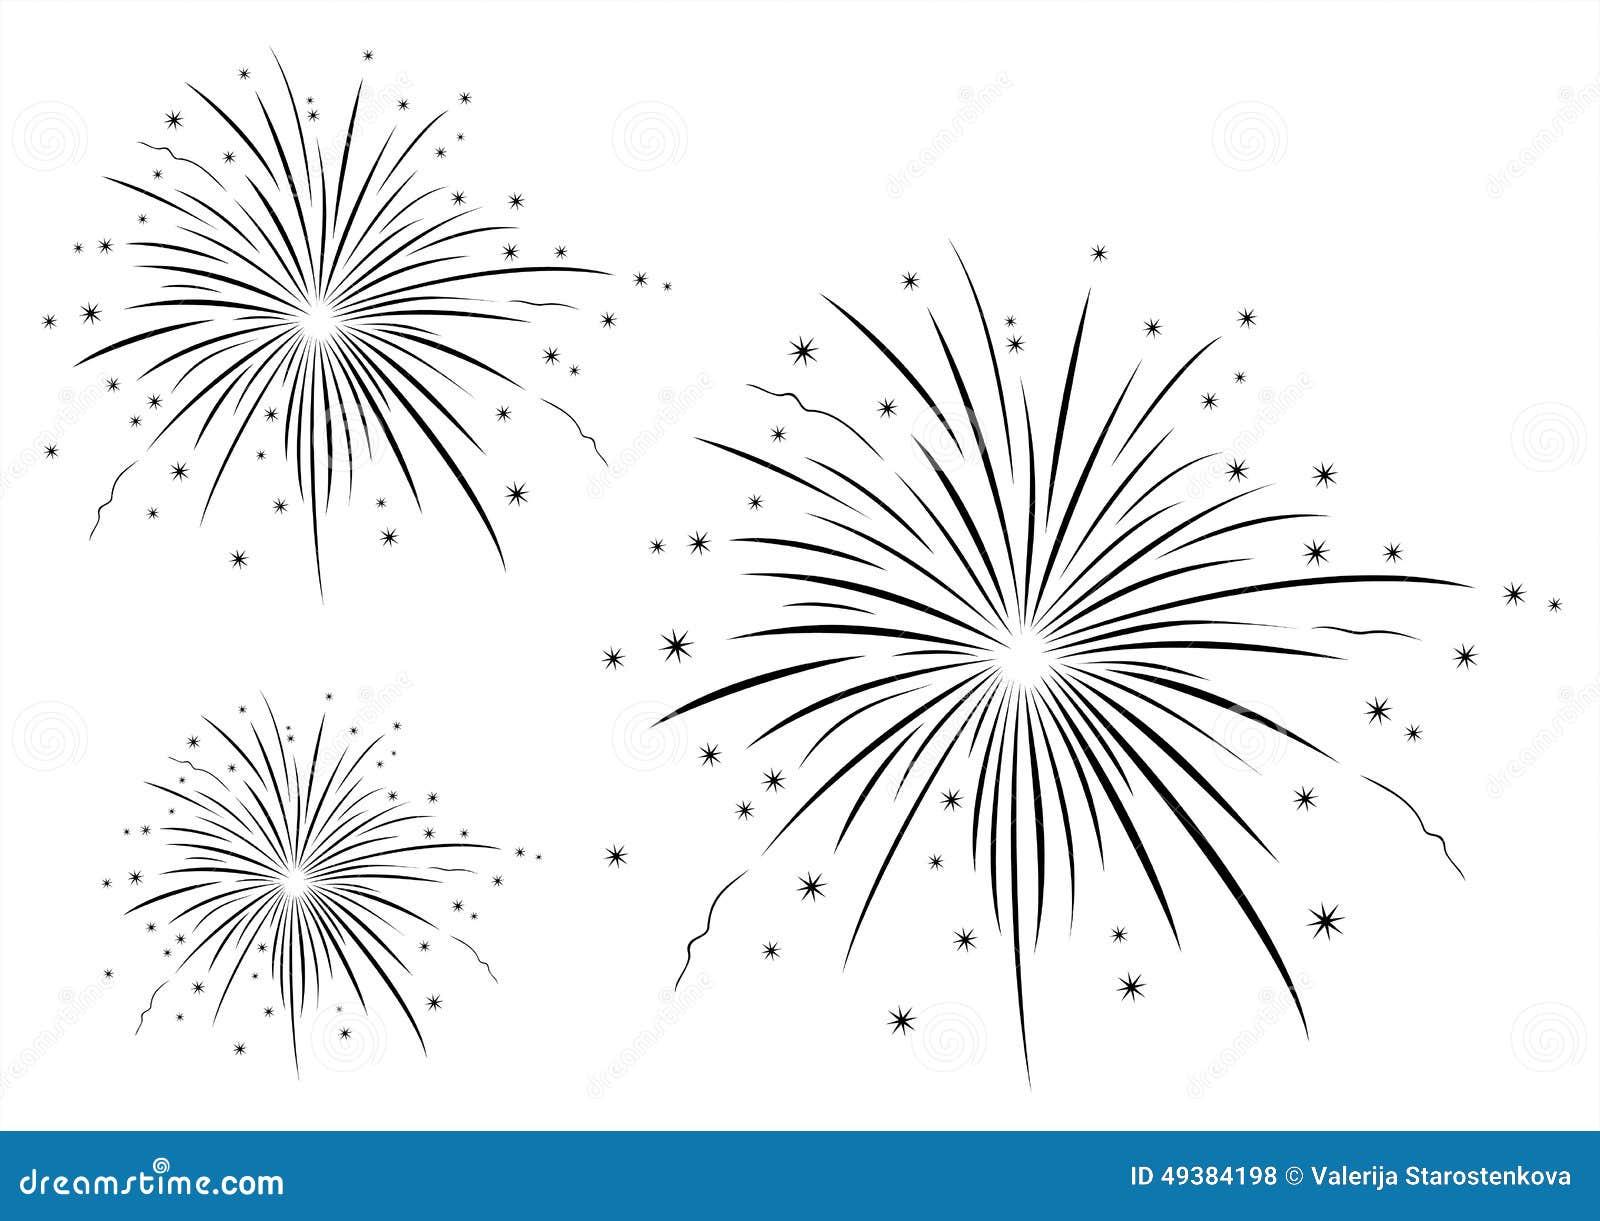 Vector Illustration Of Fireworks Black And White Stock ...